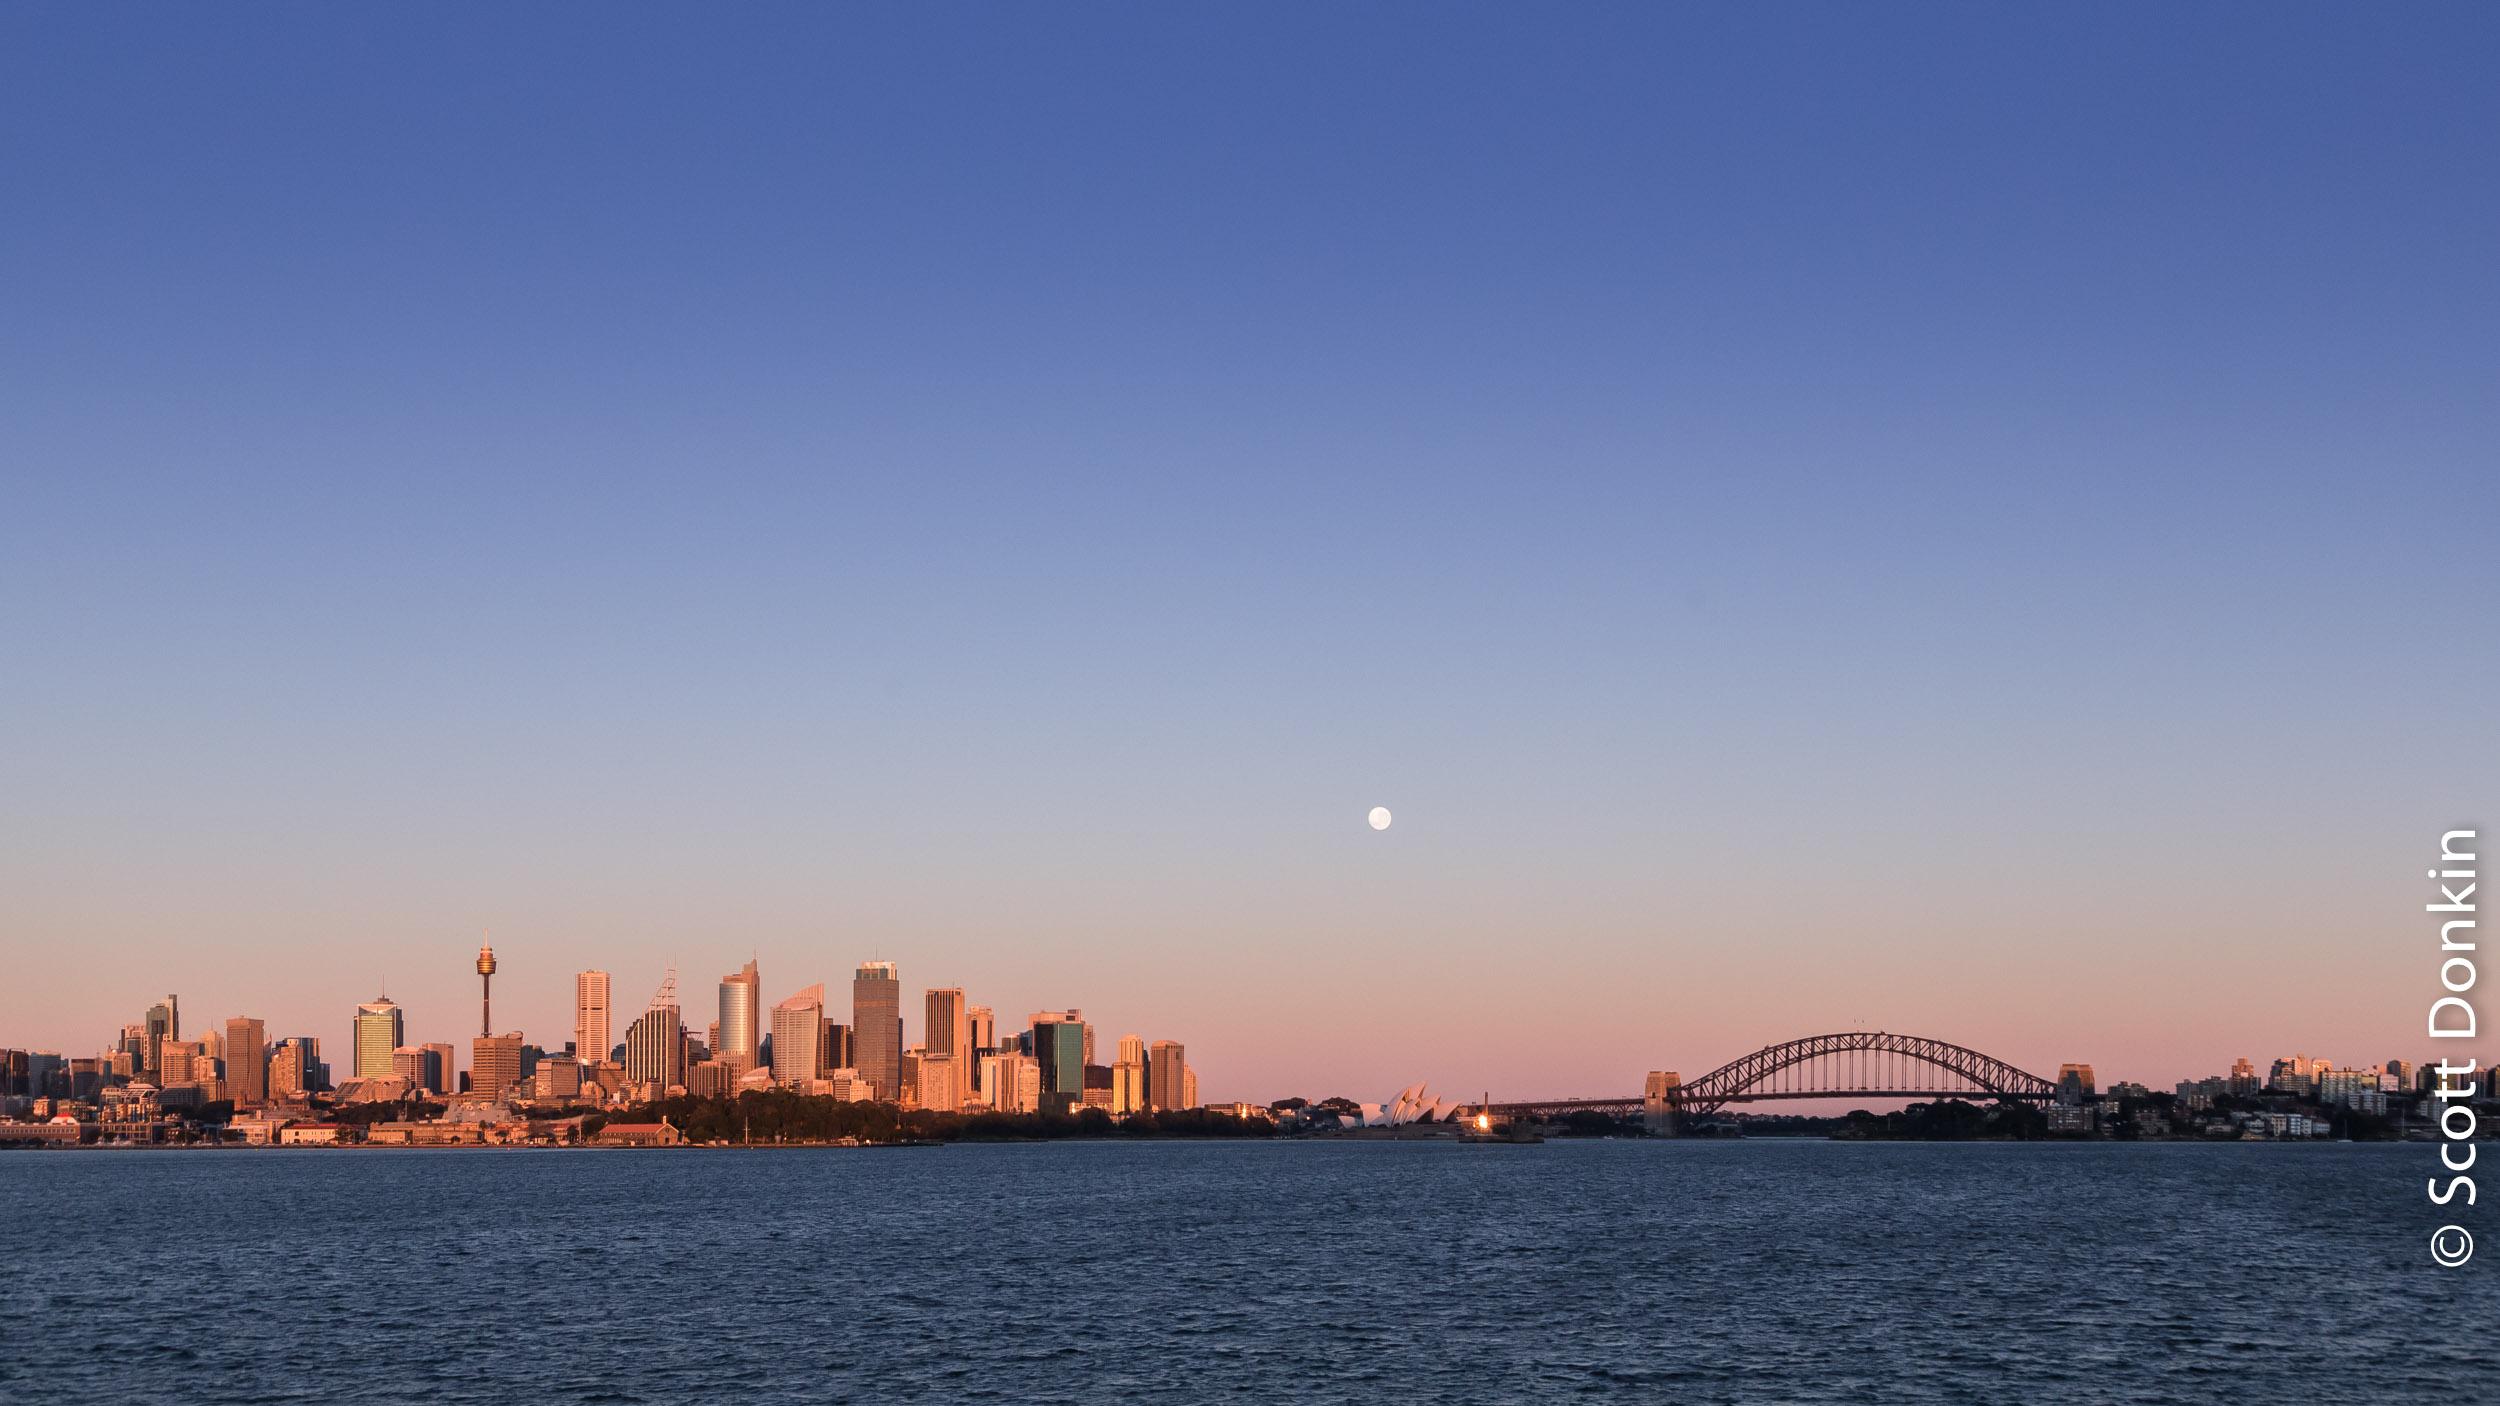 Moonset over Sydney Harbour, city skyline and Sydney Harbour Bridge. Sunrise, 9 August 2017.